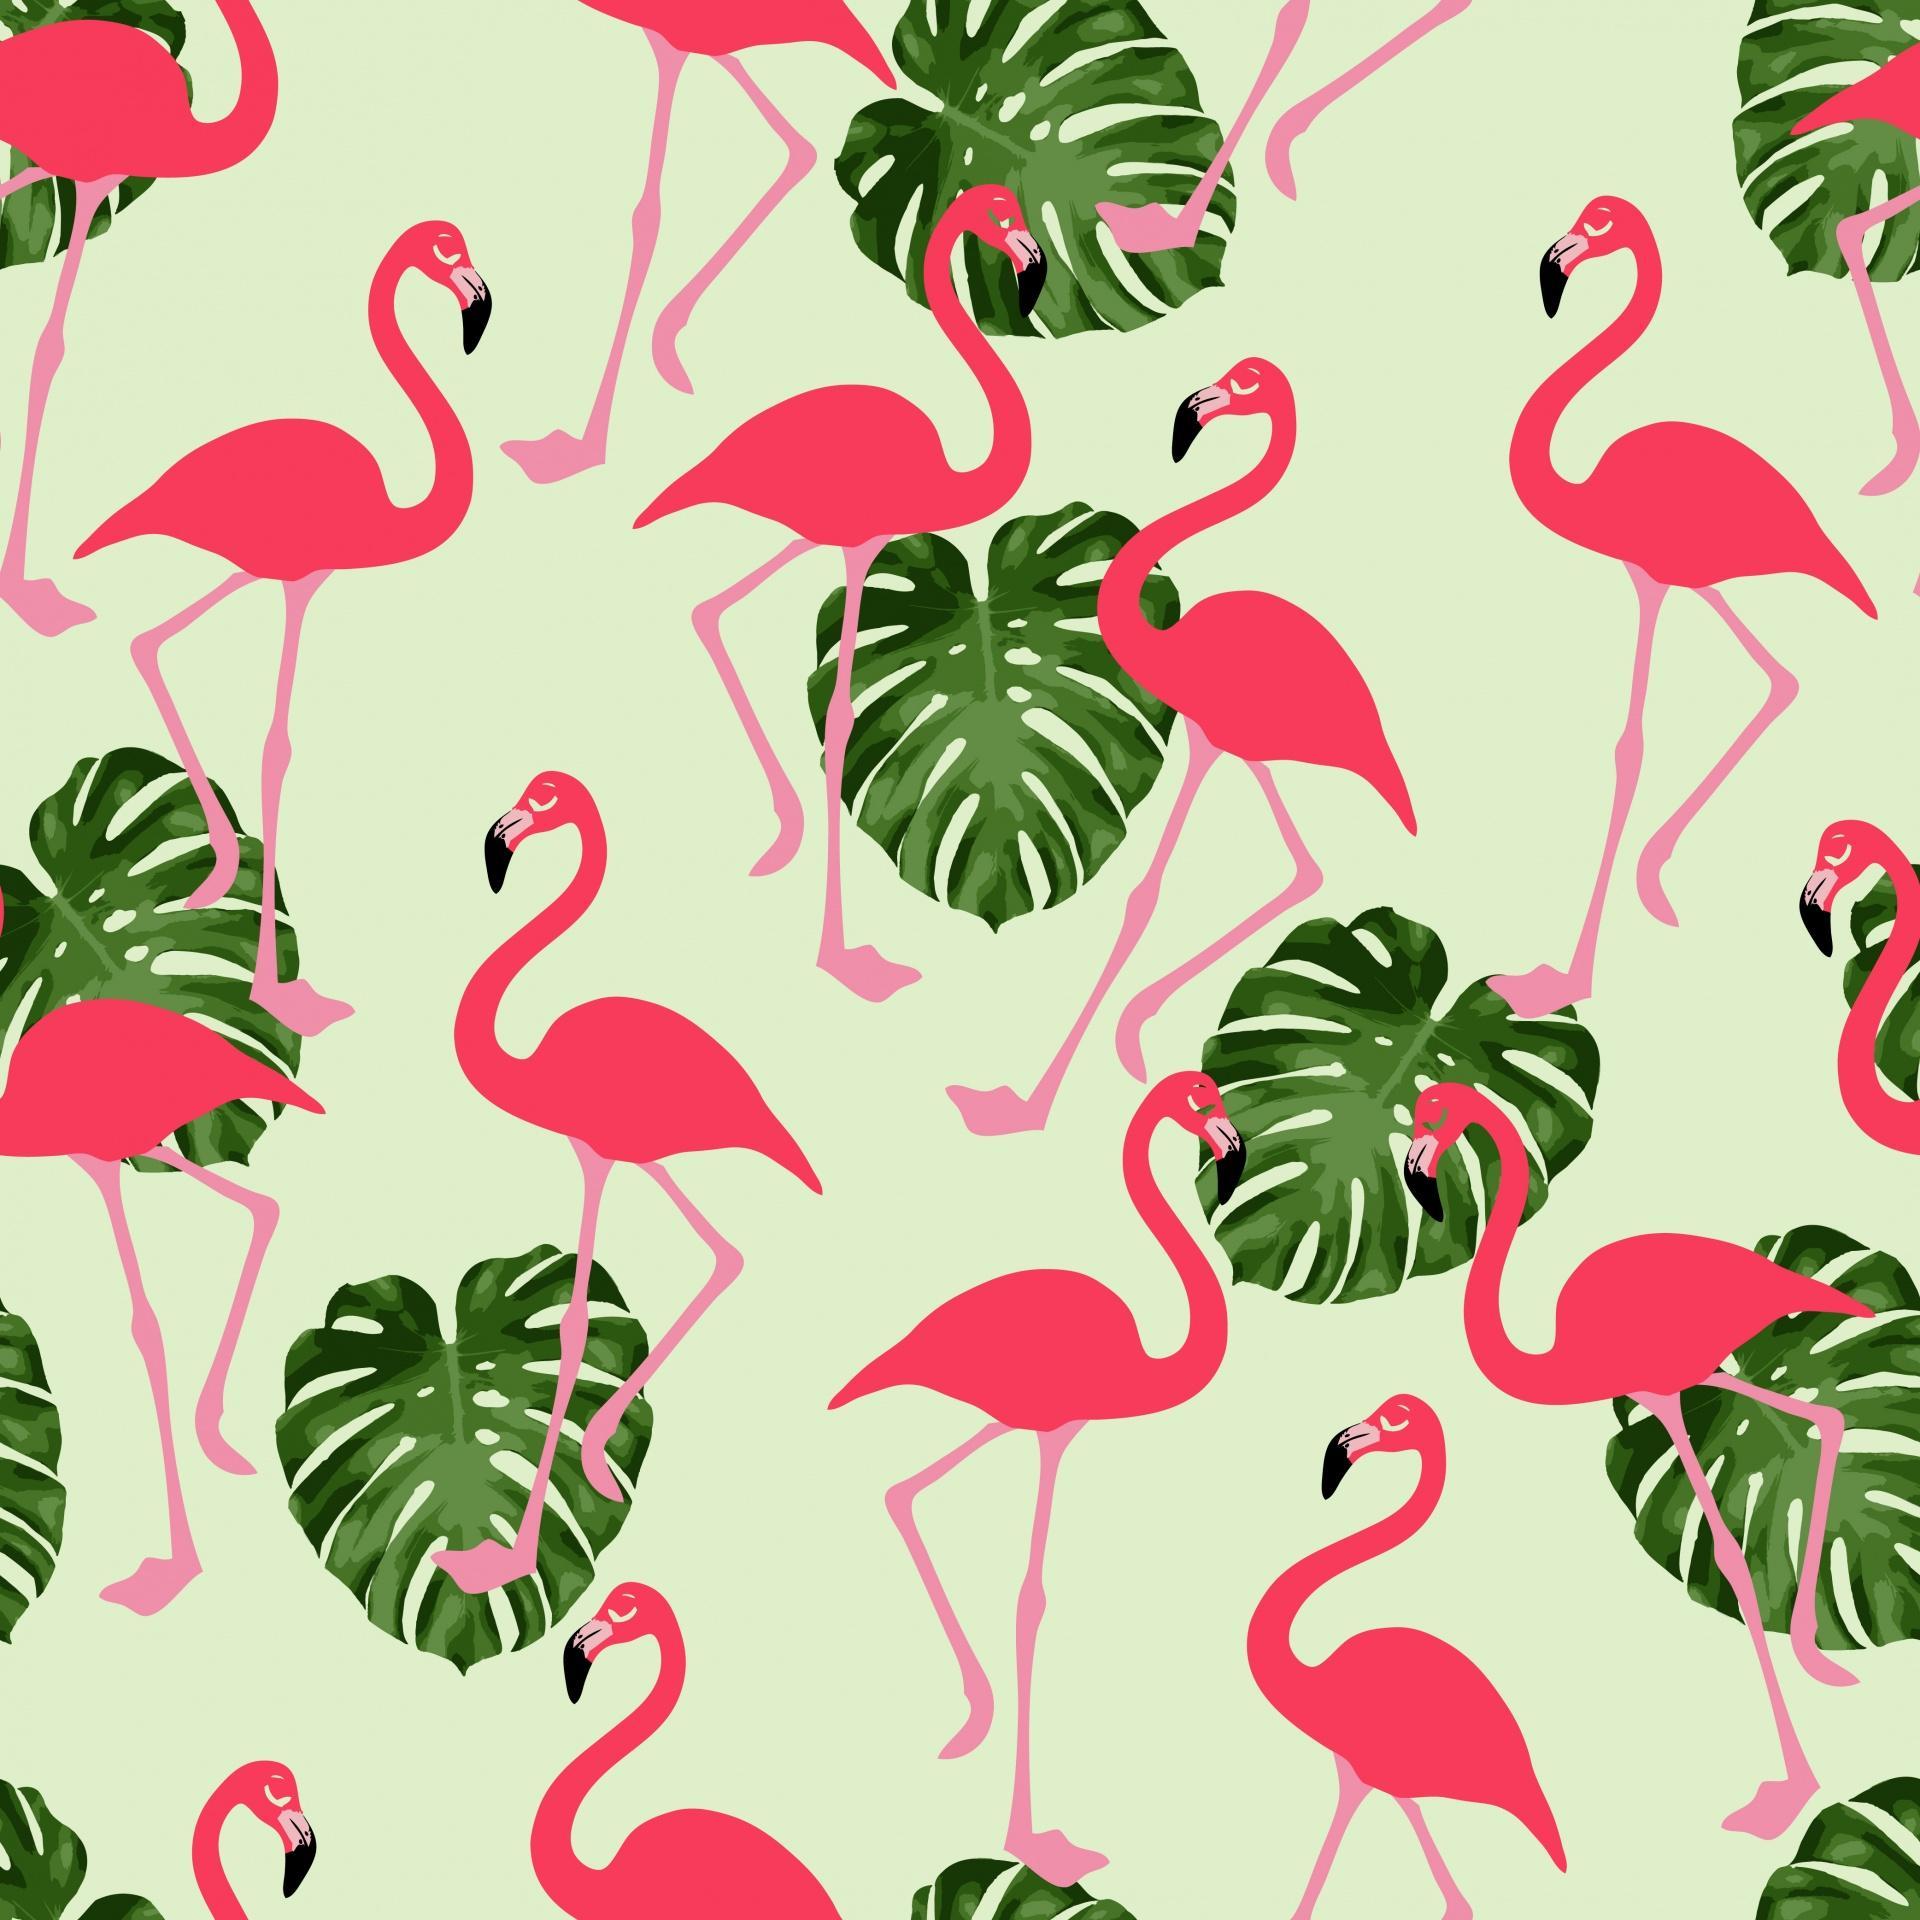 Flamingo Wallpaper Image Group 47